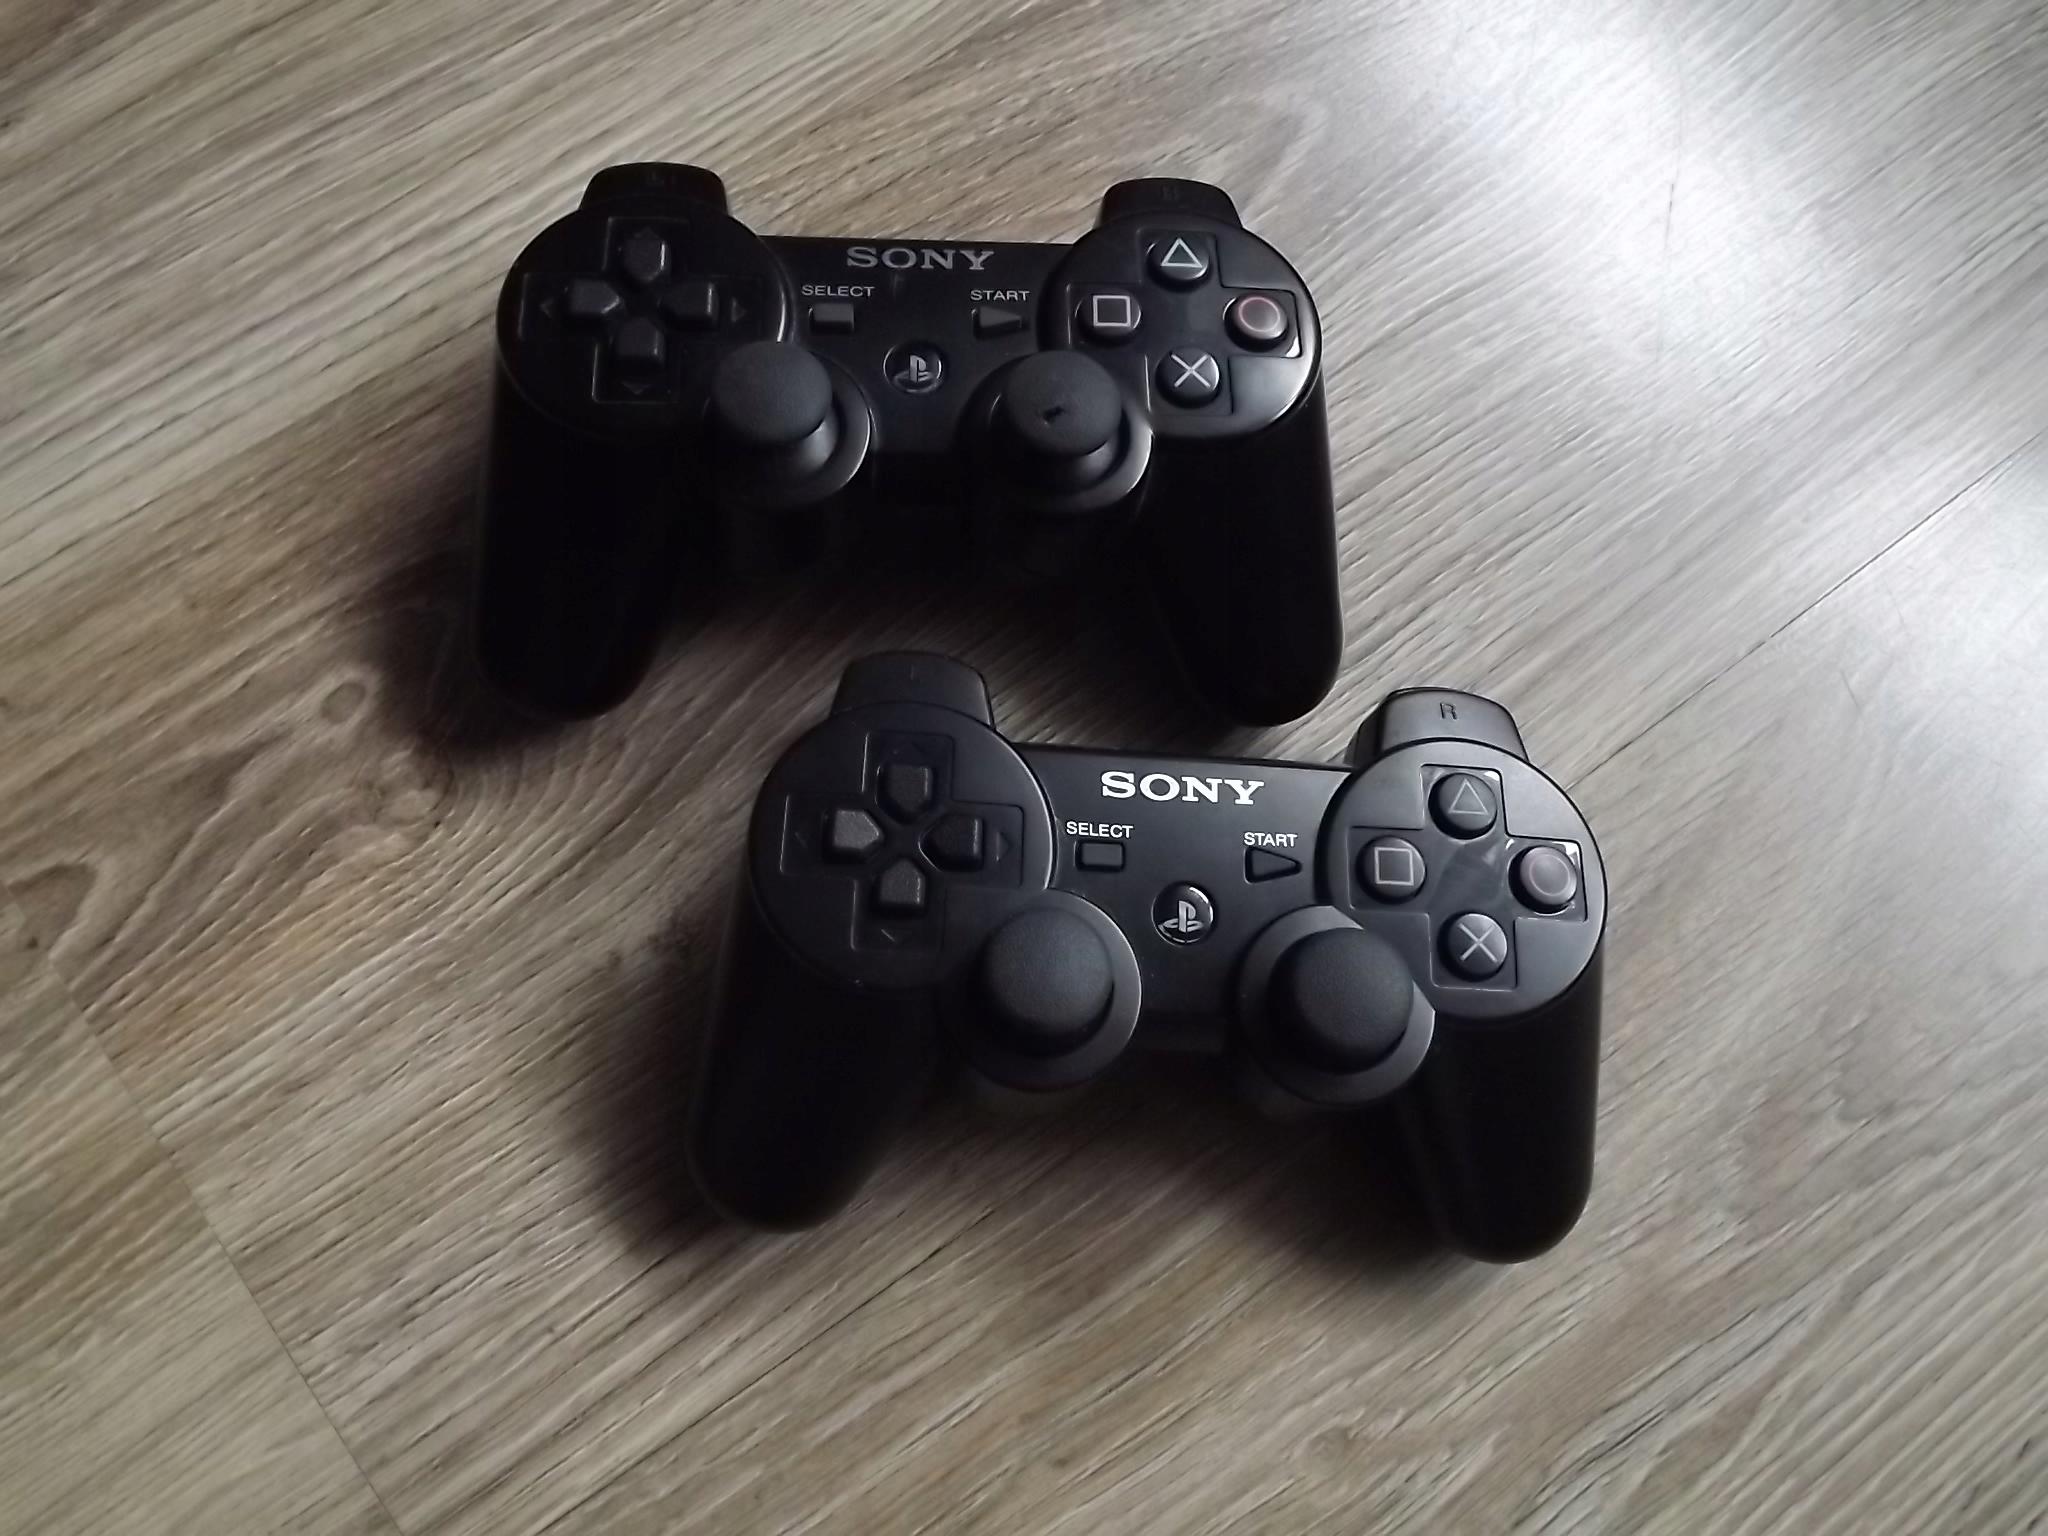 Oryginalny pad SONY do PS3.